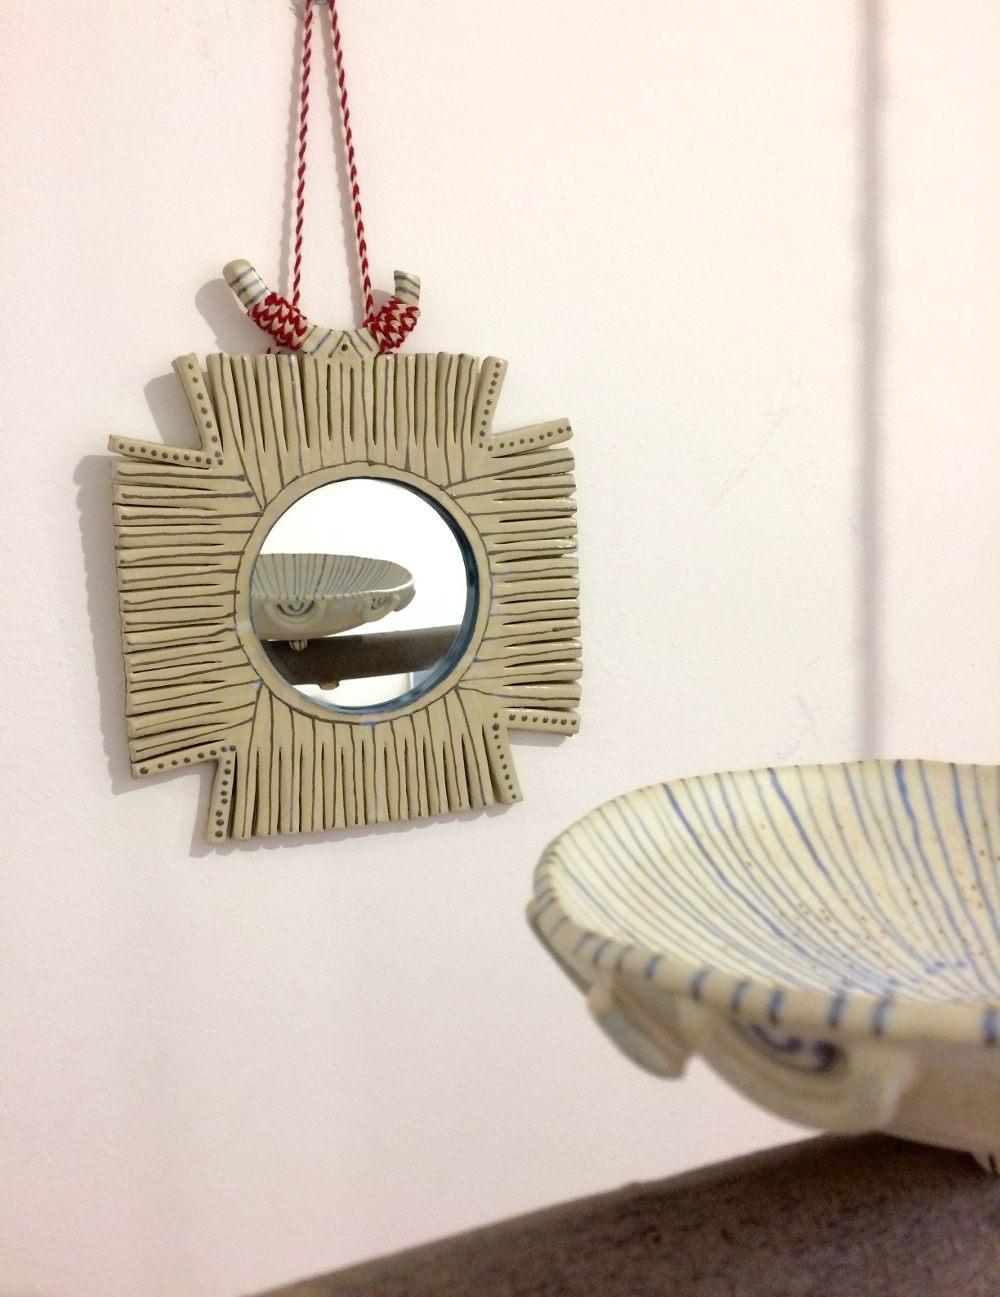 creative handmade mirrors - HD1000×1297